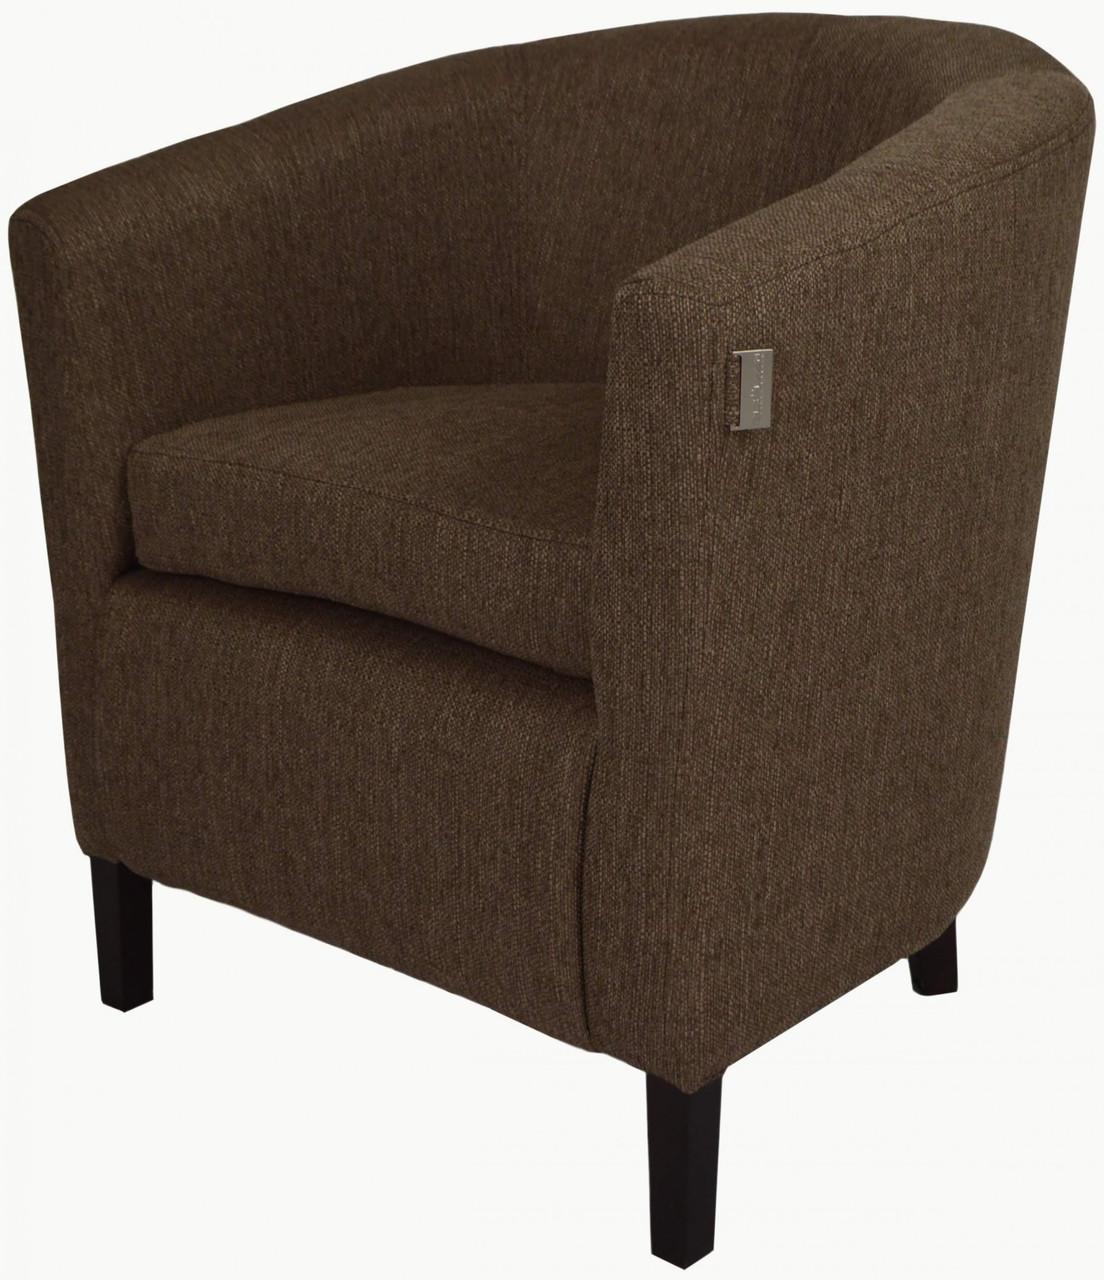 Кресло Richman Бафи 65 x 65 x 80H Артемис 03 Коричневое